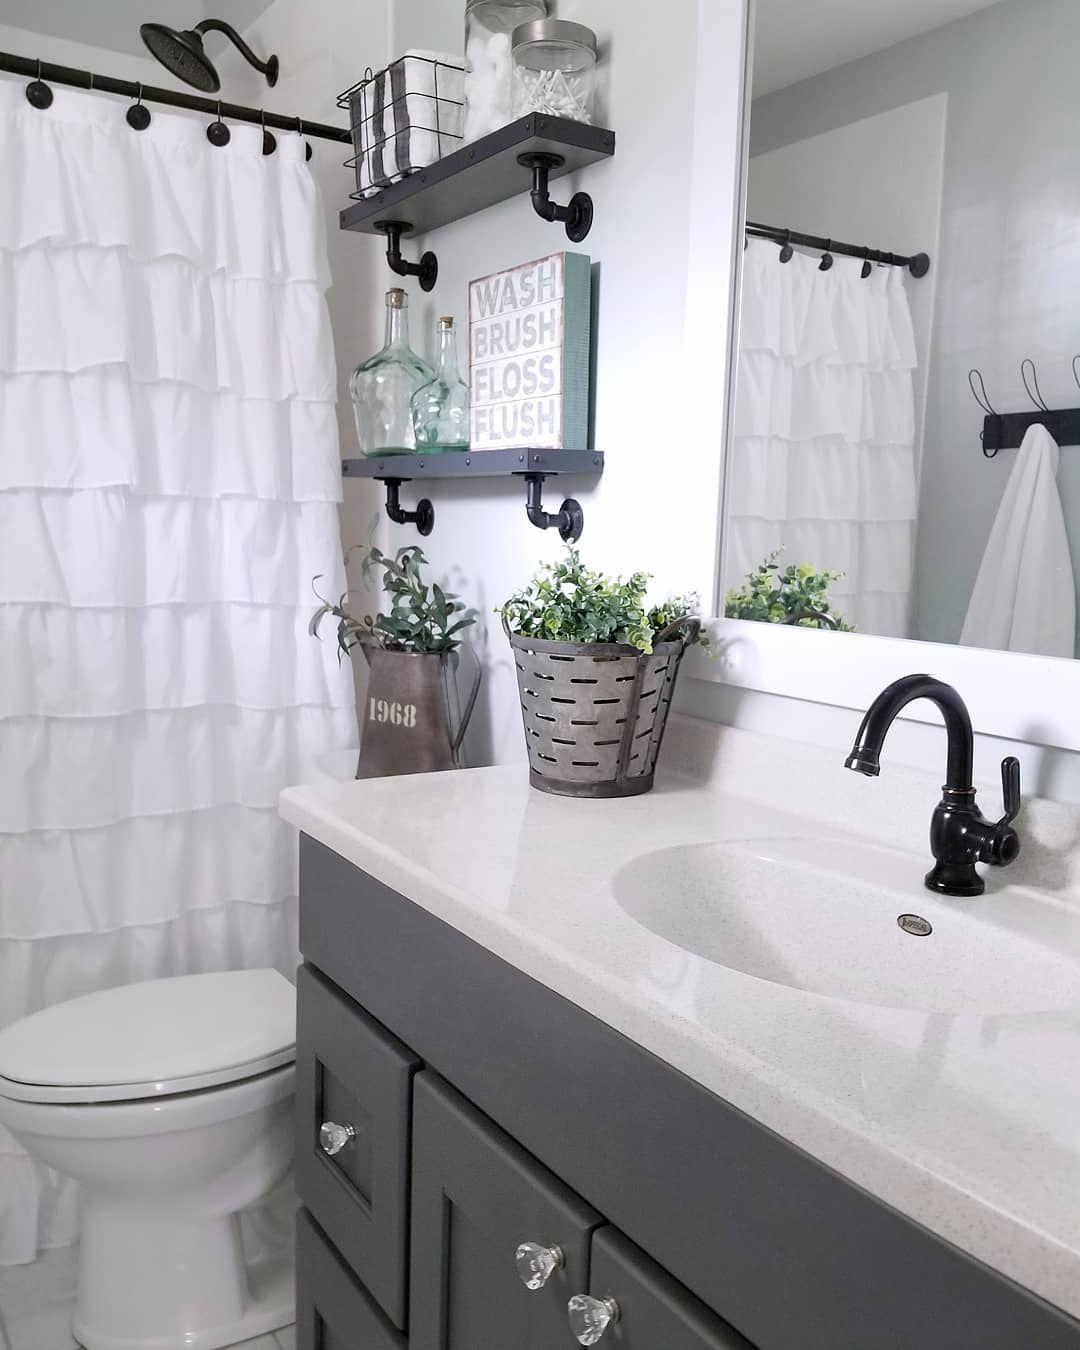 pinterest vsco insta blakeissiah bathroom renovation on bathroom renovation ideas diy id=53896